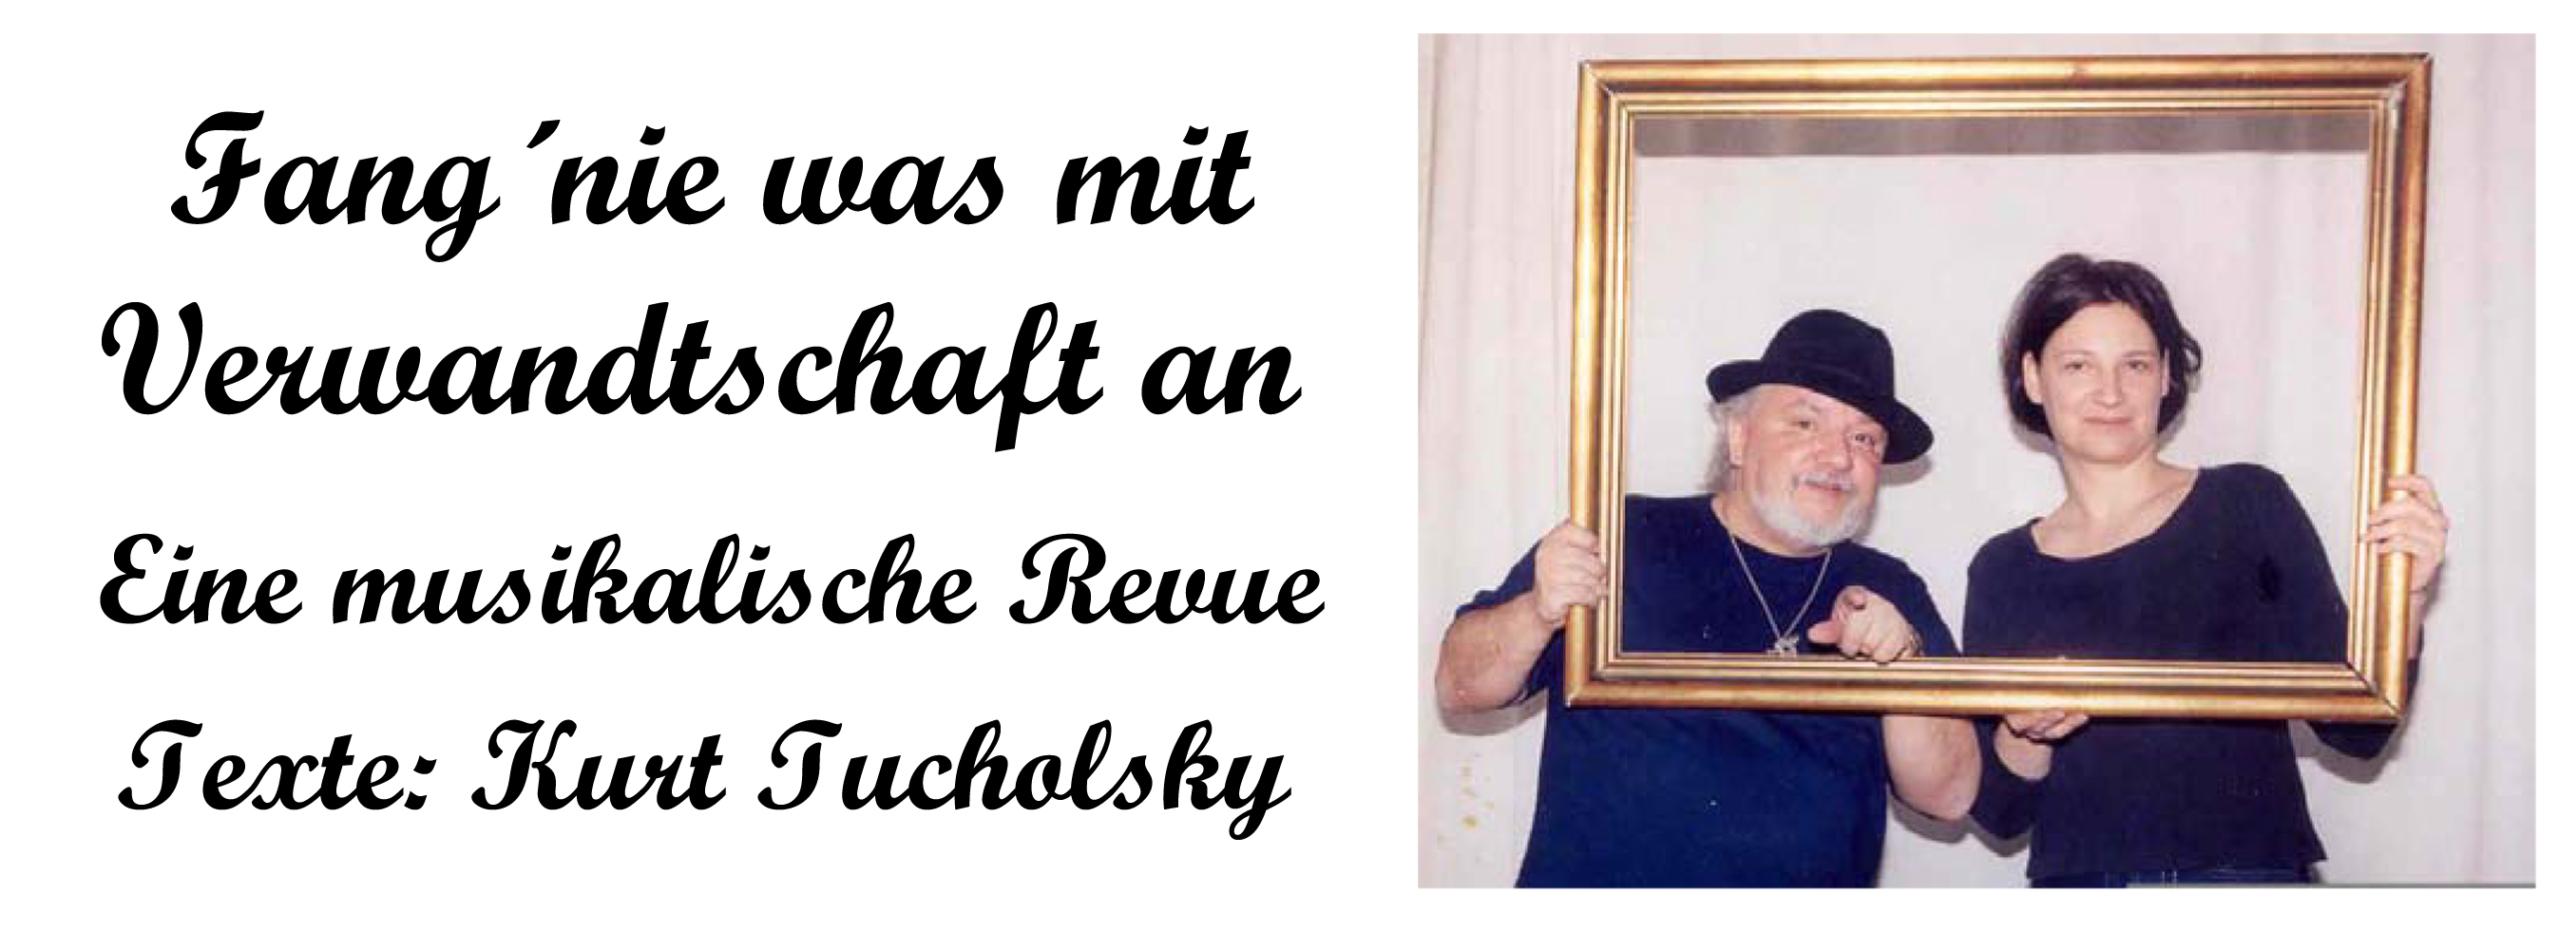 tucholsky kabarett im terzomondo